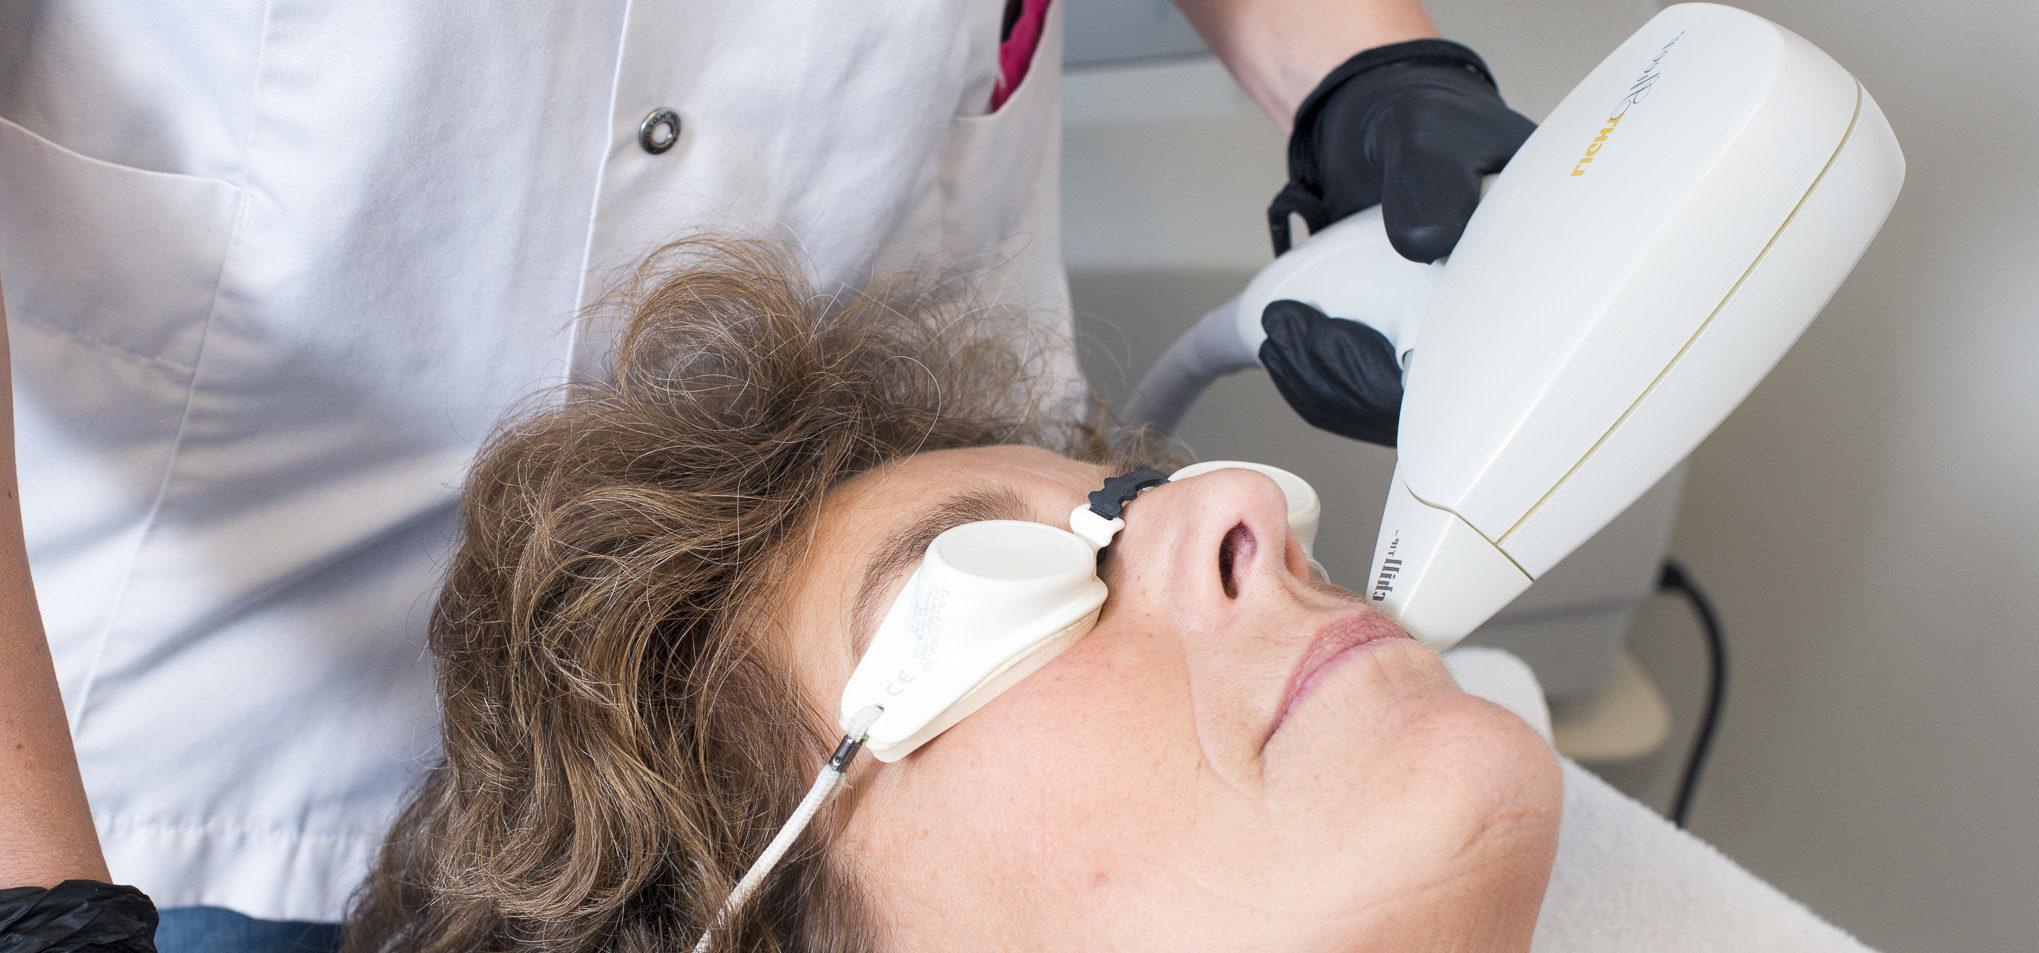 Foto laserbehandeling bovenlip vrouw